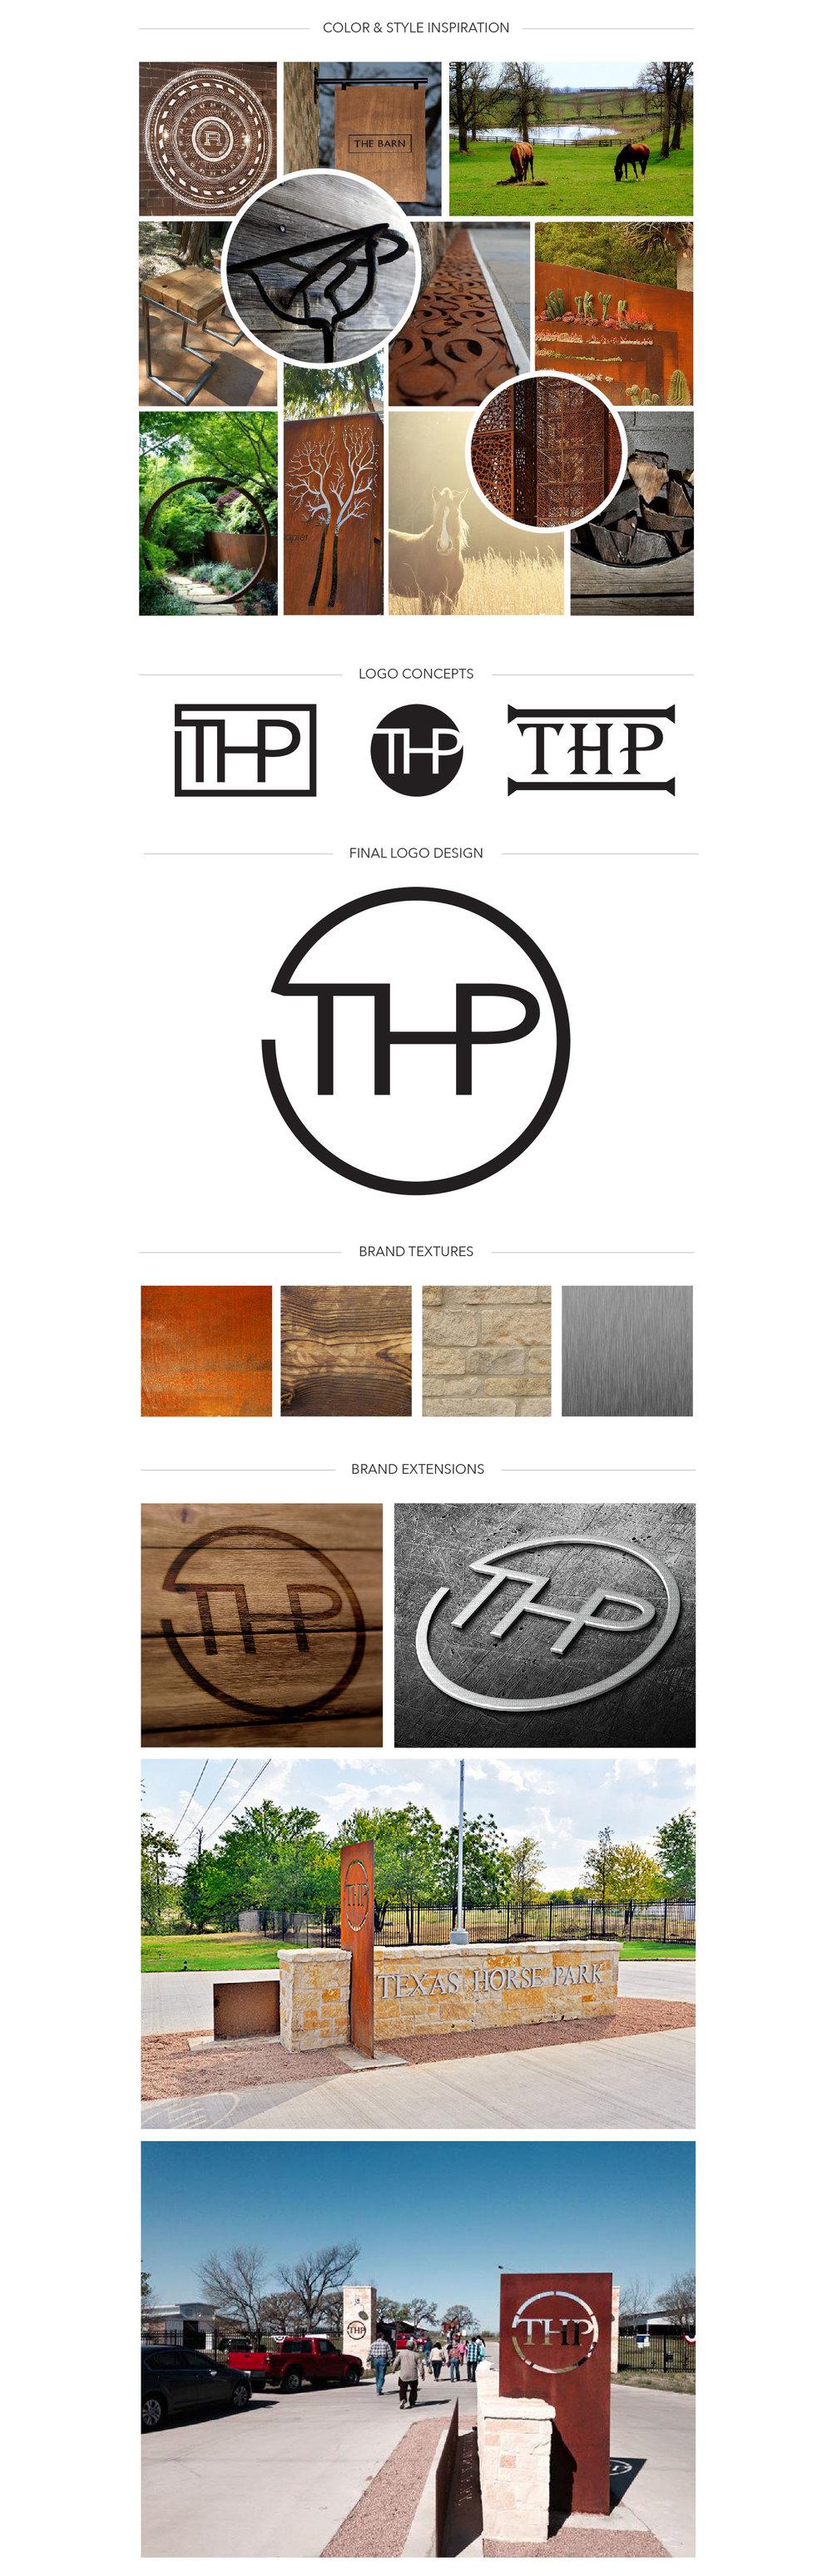 THP Process-01.jpg